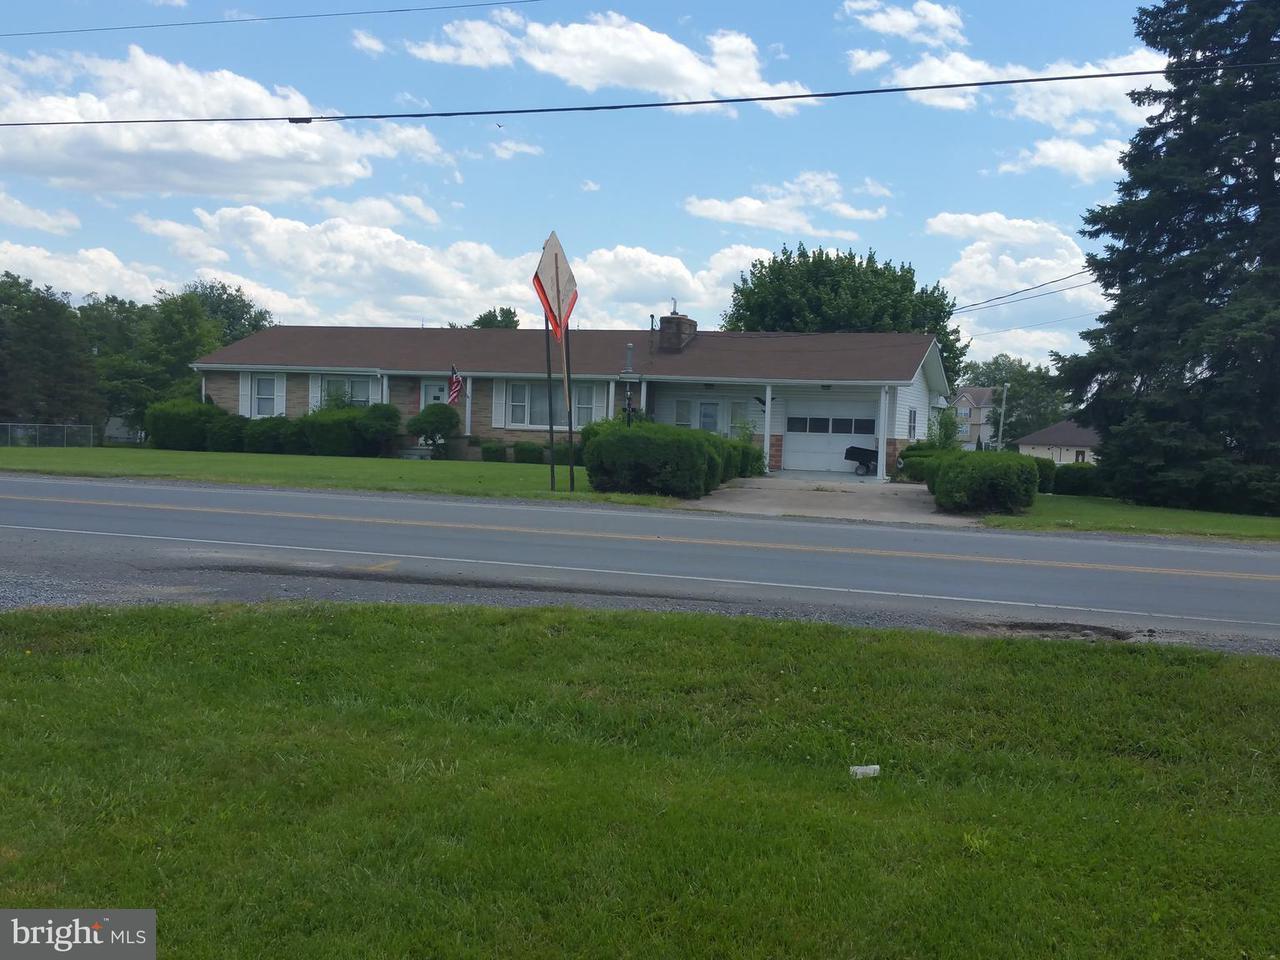 komerziell für Verkauf beim 21 Pedal Car Drive 21 Pedal Car Drive Inwood, West Virginia 25428 Vereinigte Staaten